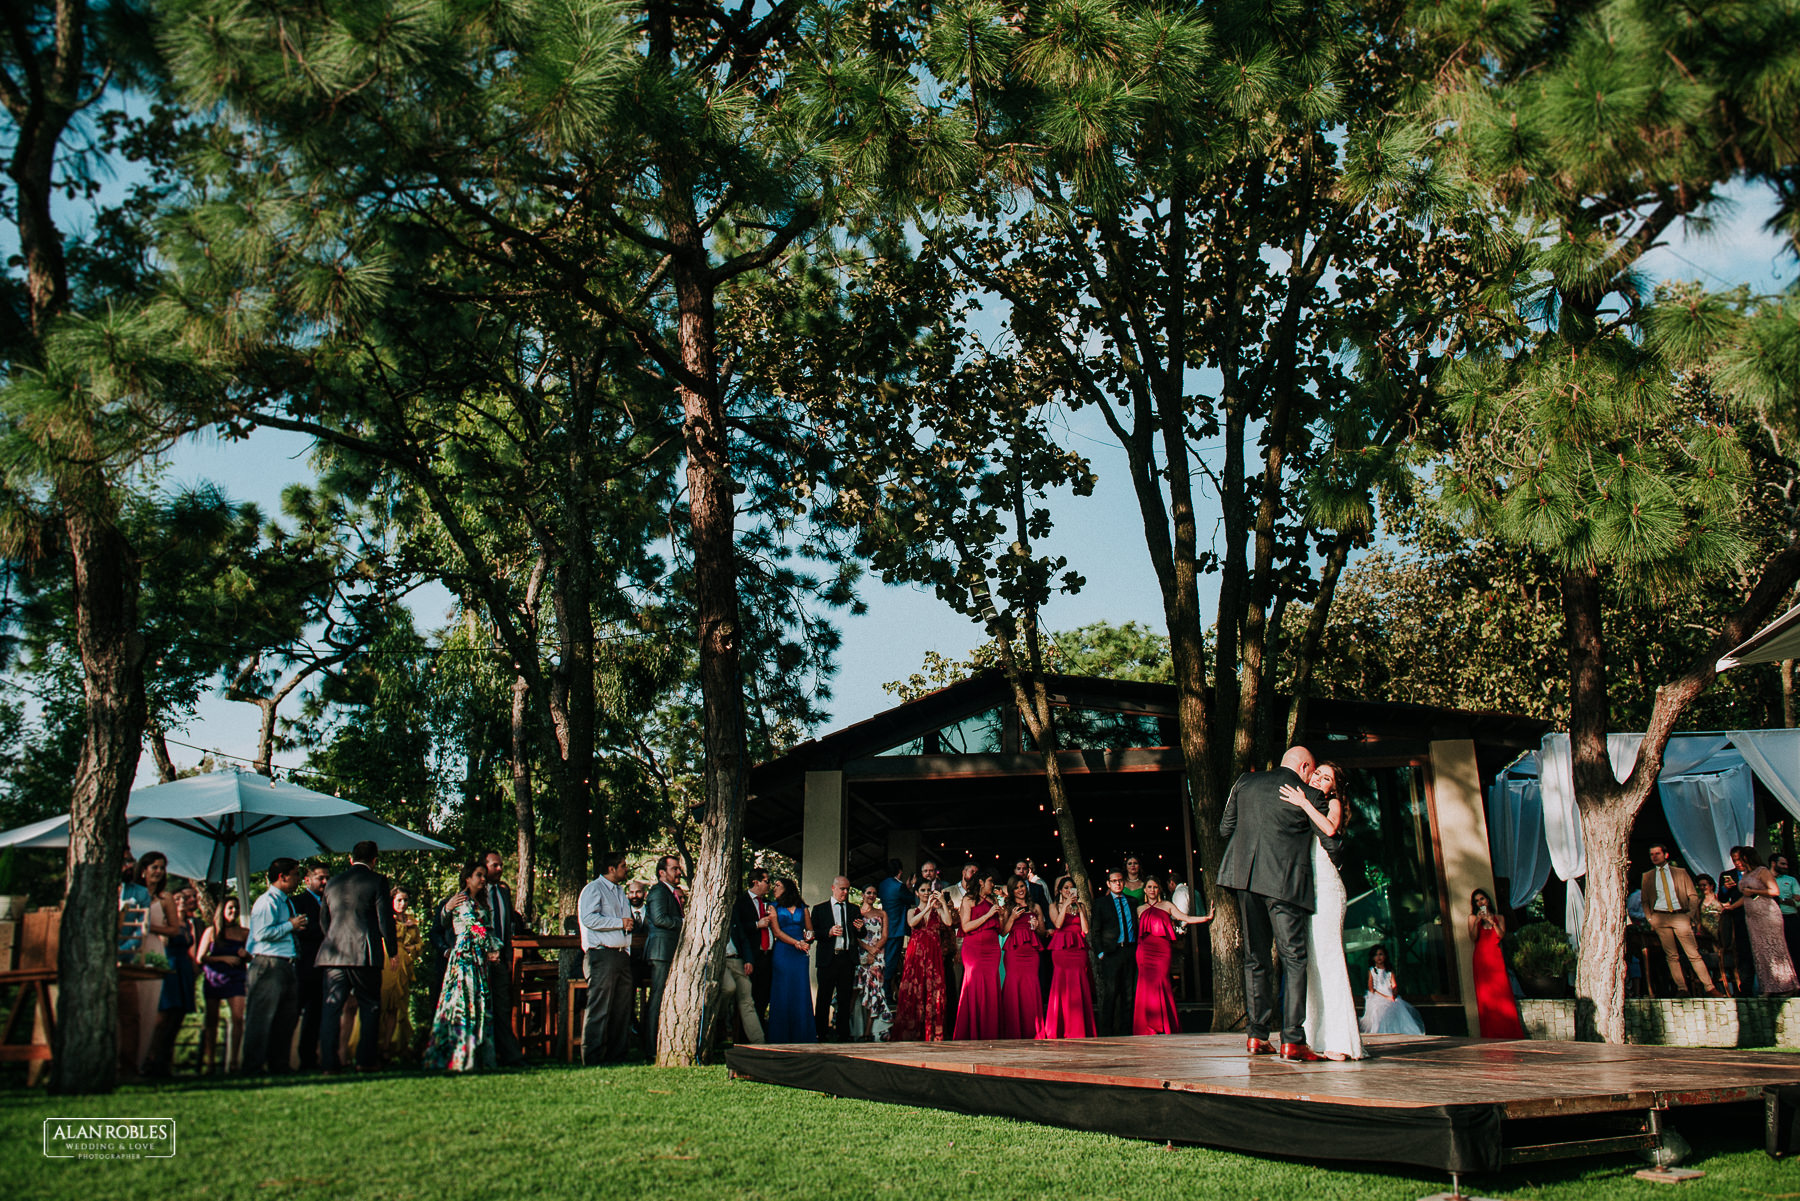 Fotografo de bodas guadalajara Alan Robles - Pinare terraza bistro 48